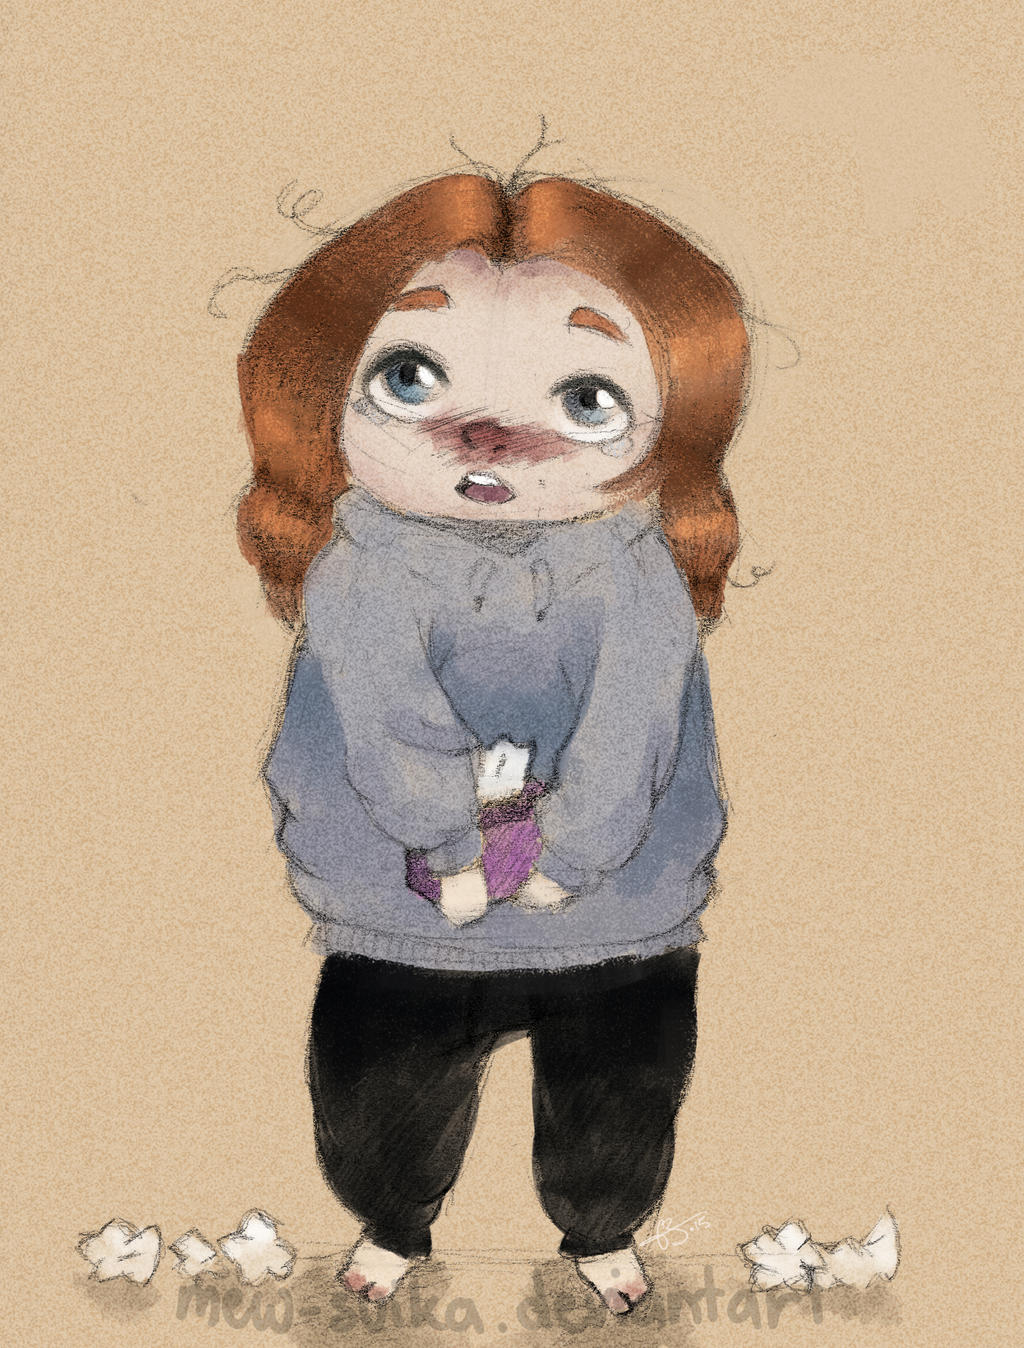 Mew-Suika's Profile Picture